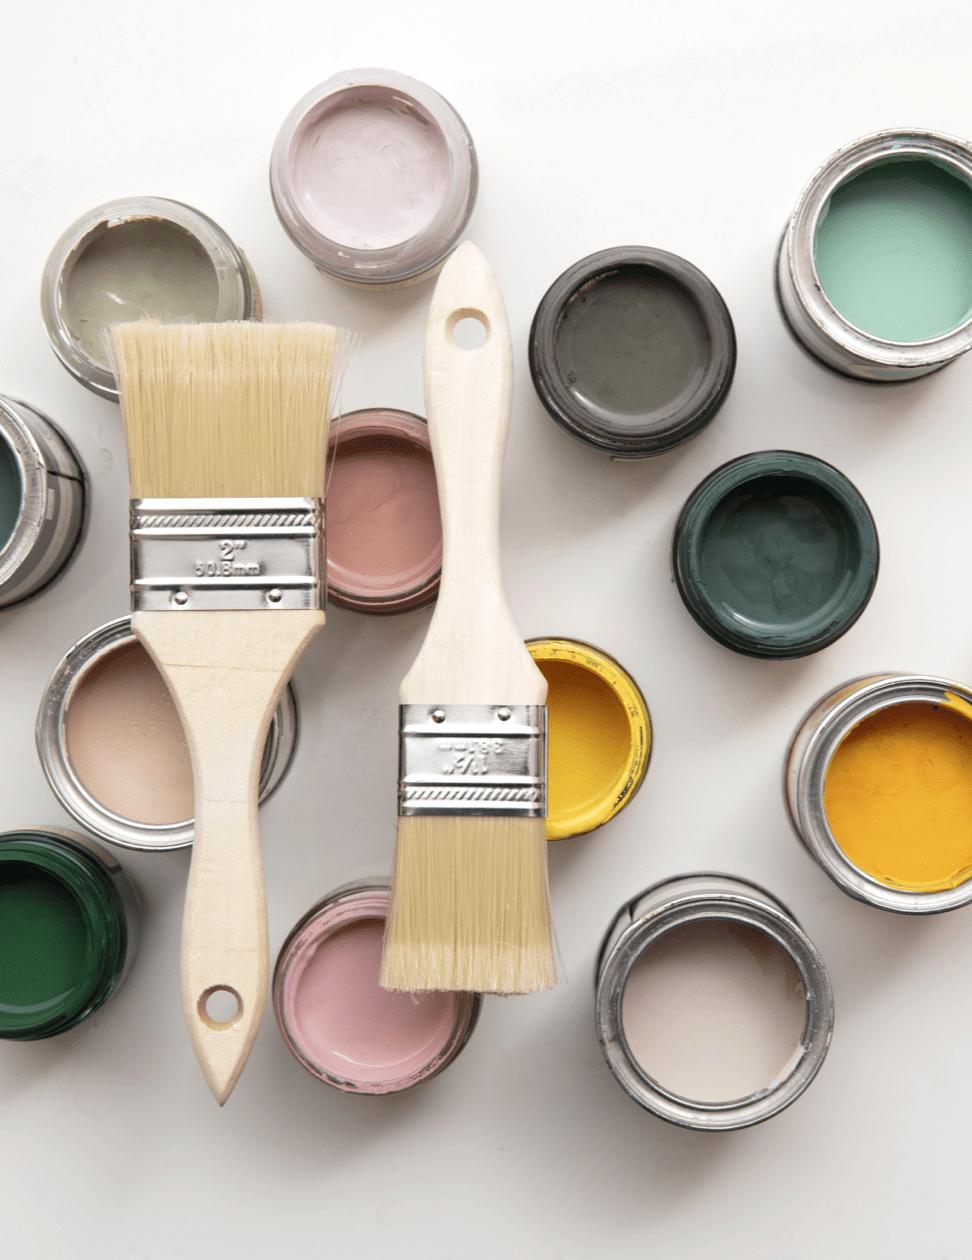 kwasten kleuren palet verf